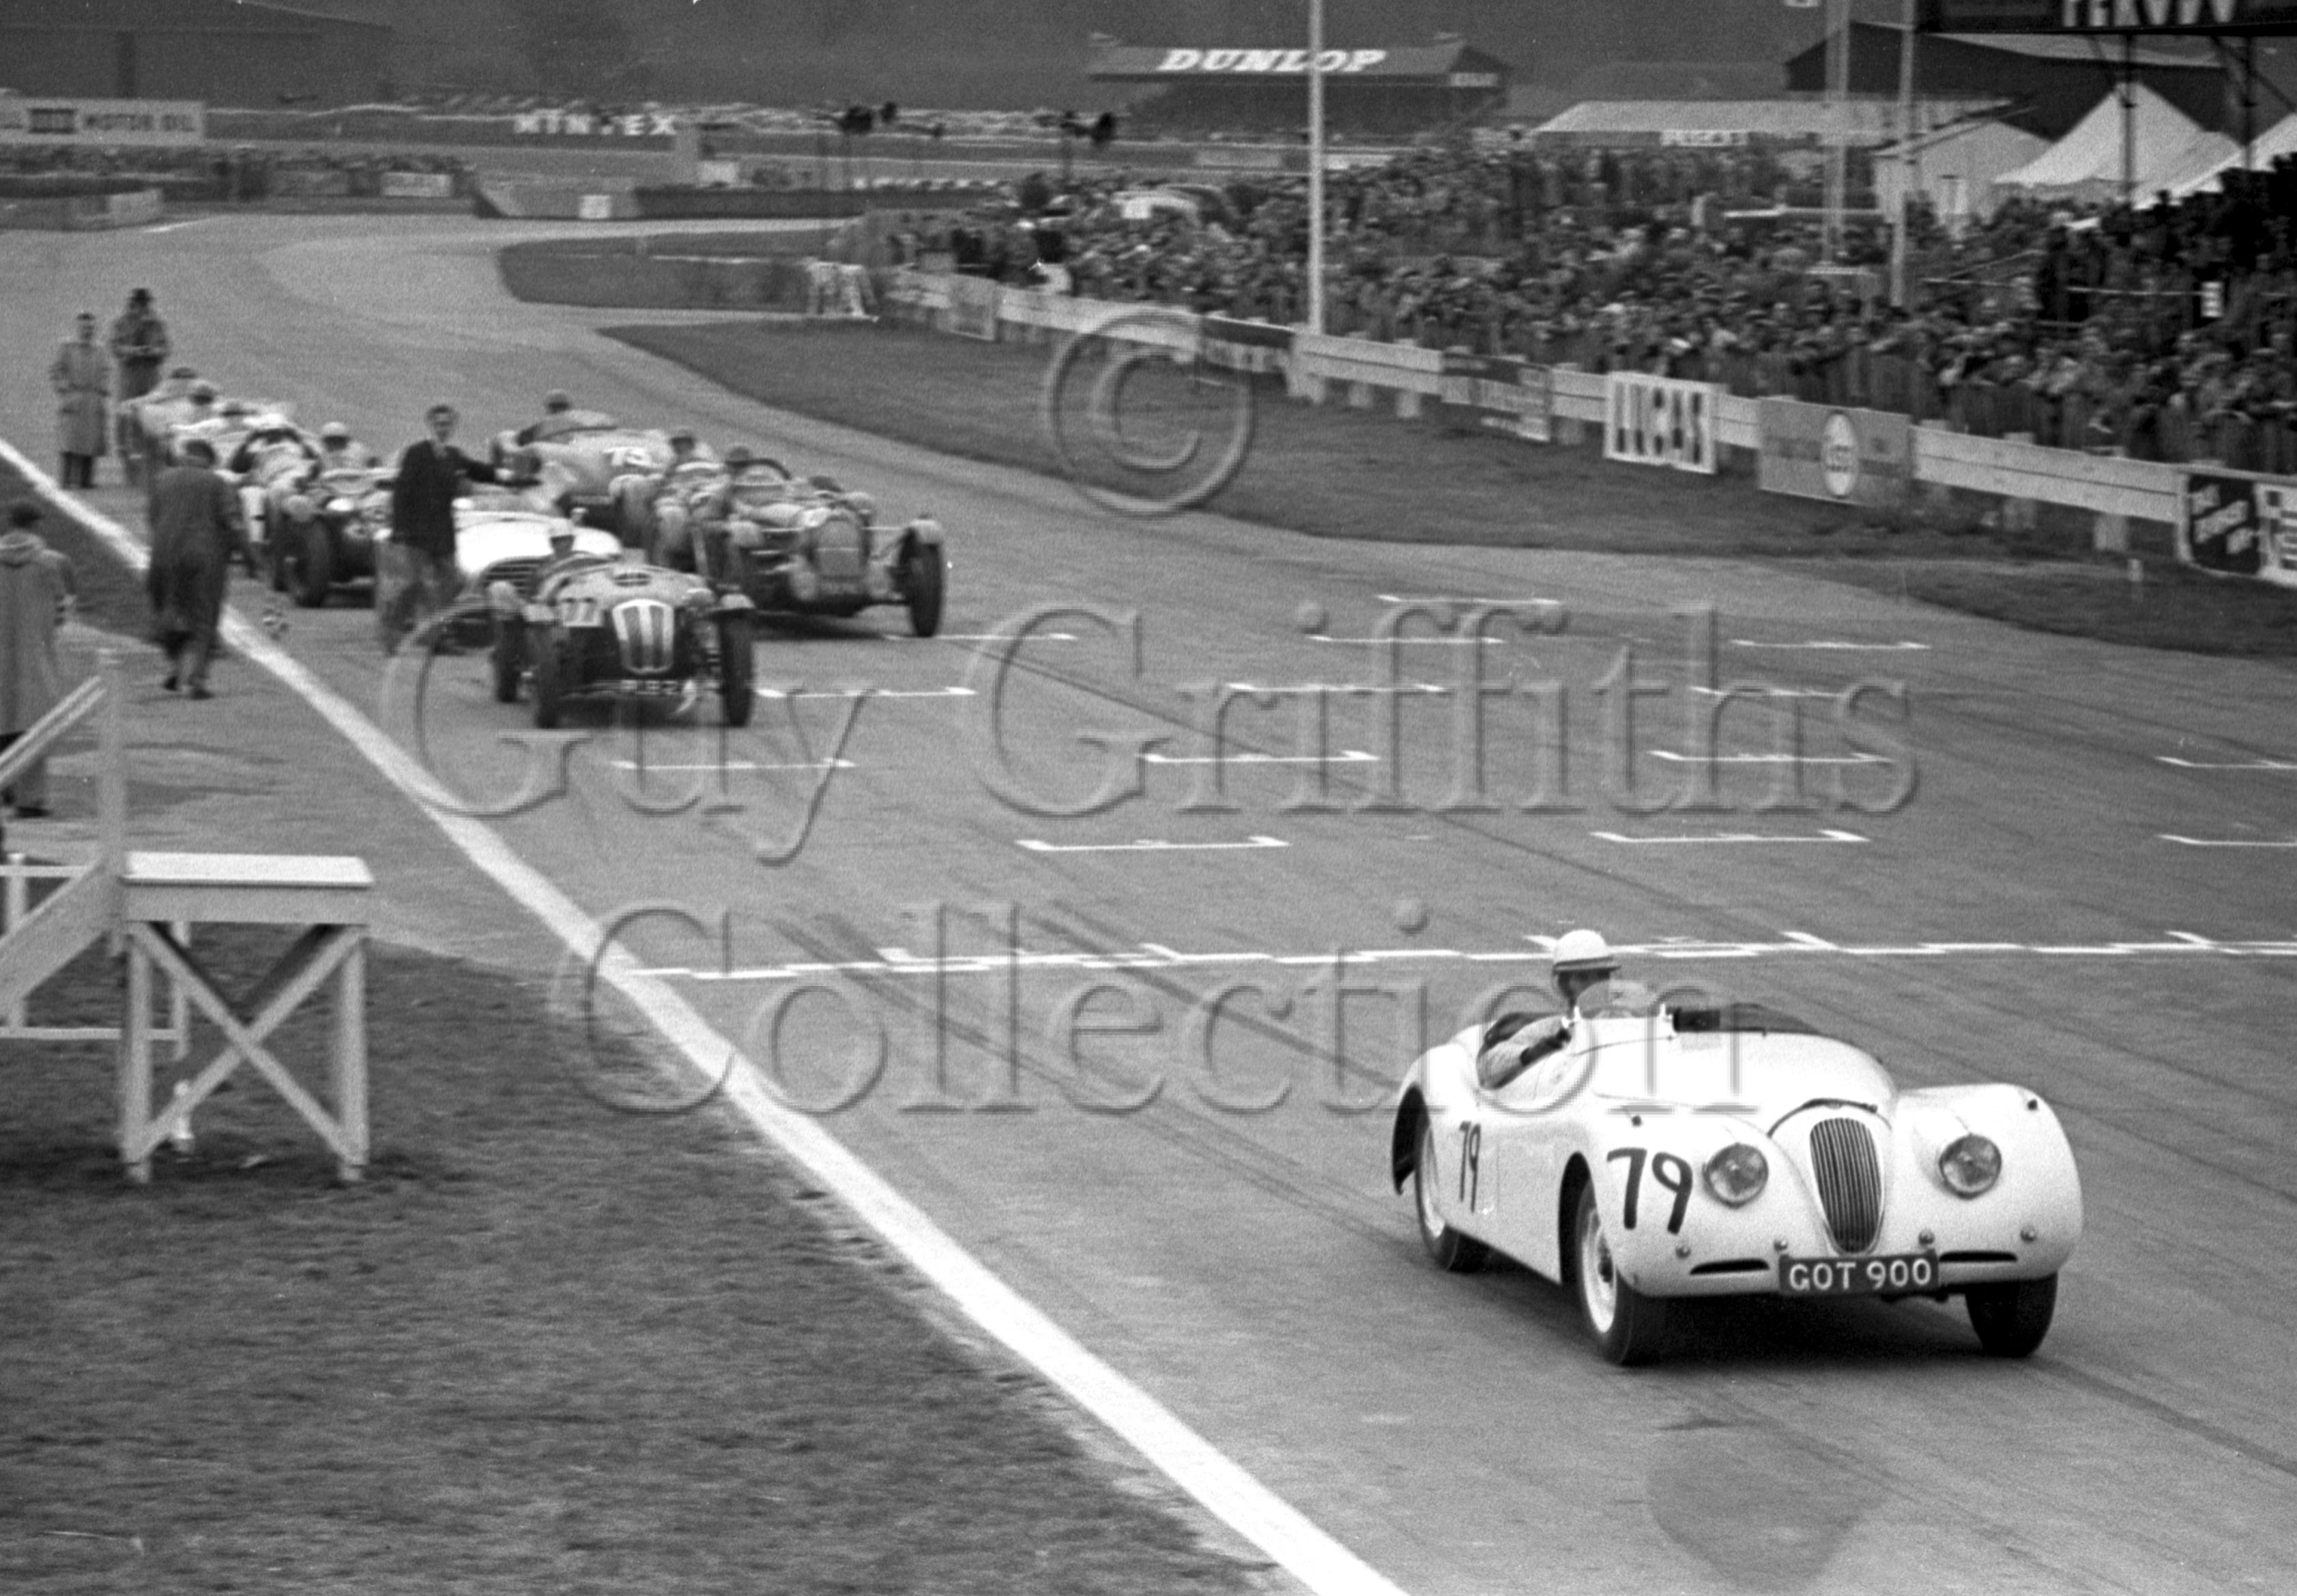 66-643–M-Head–Jaguar–Goodwood–06-04-1953.jpg - Guy Griffiths Collection